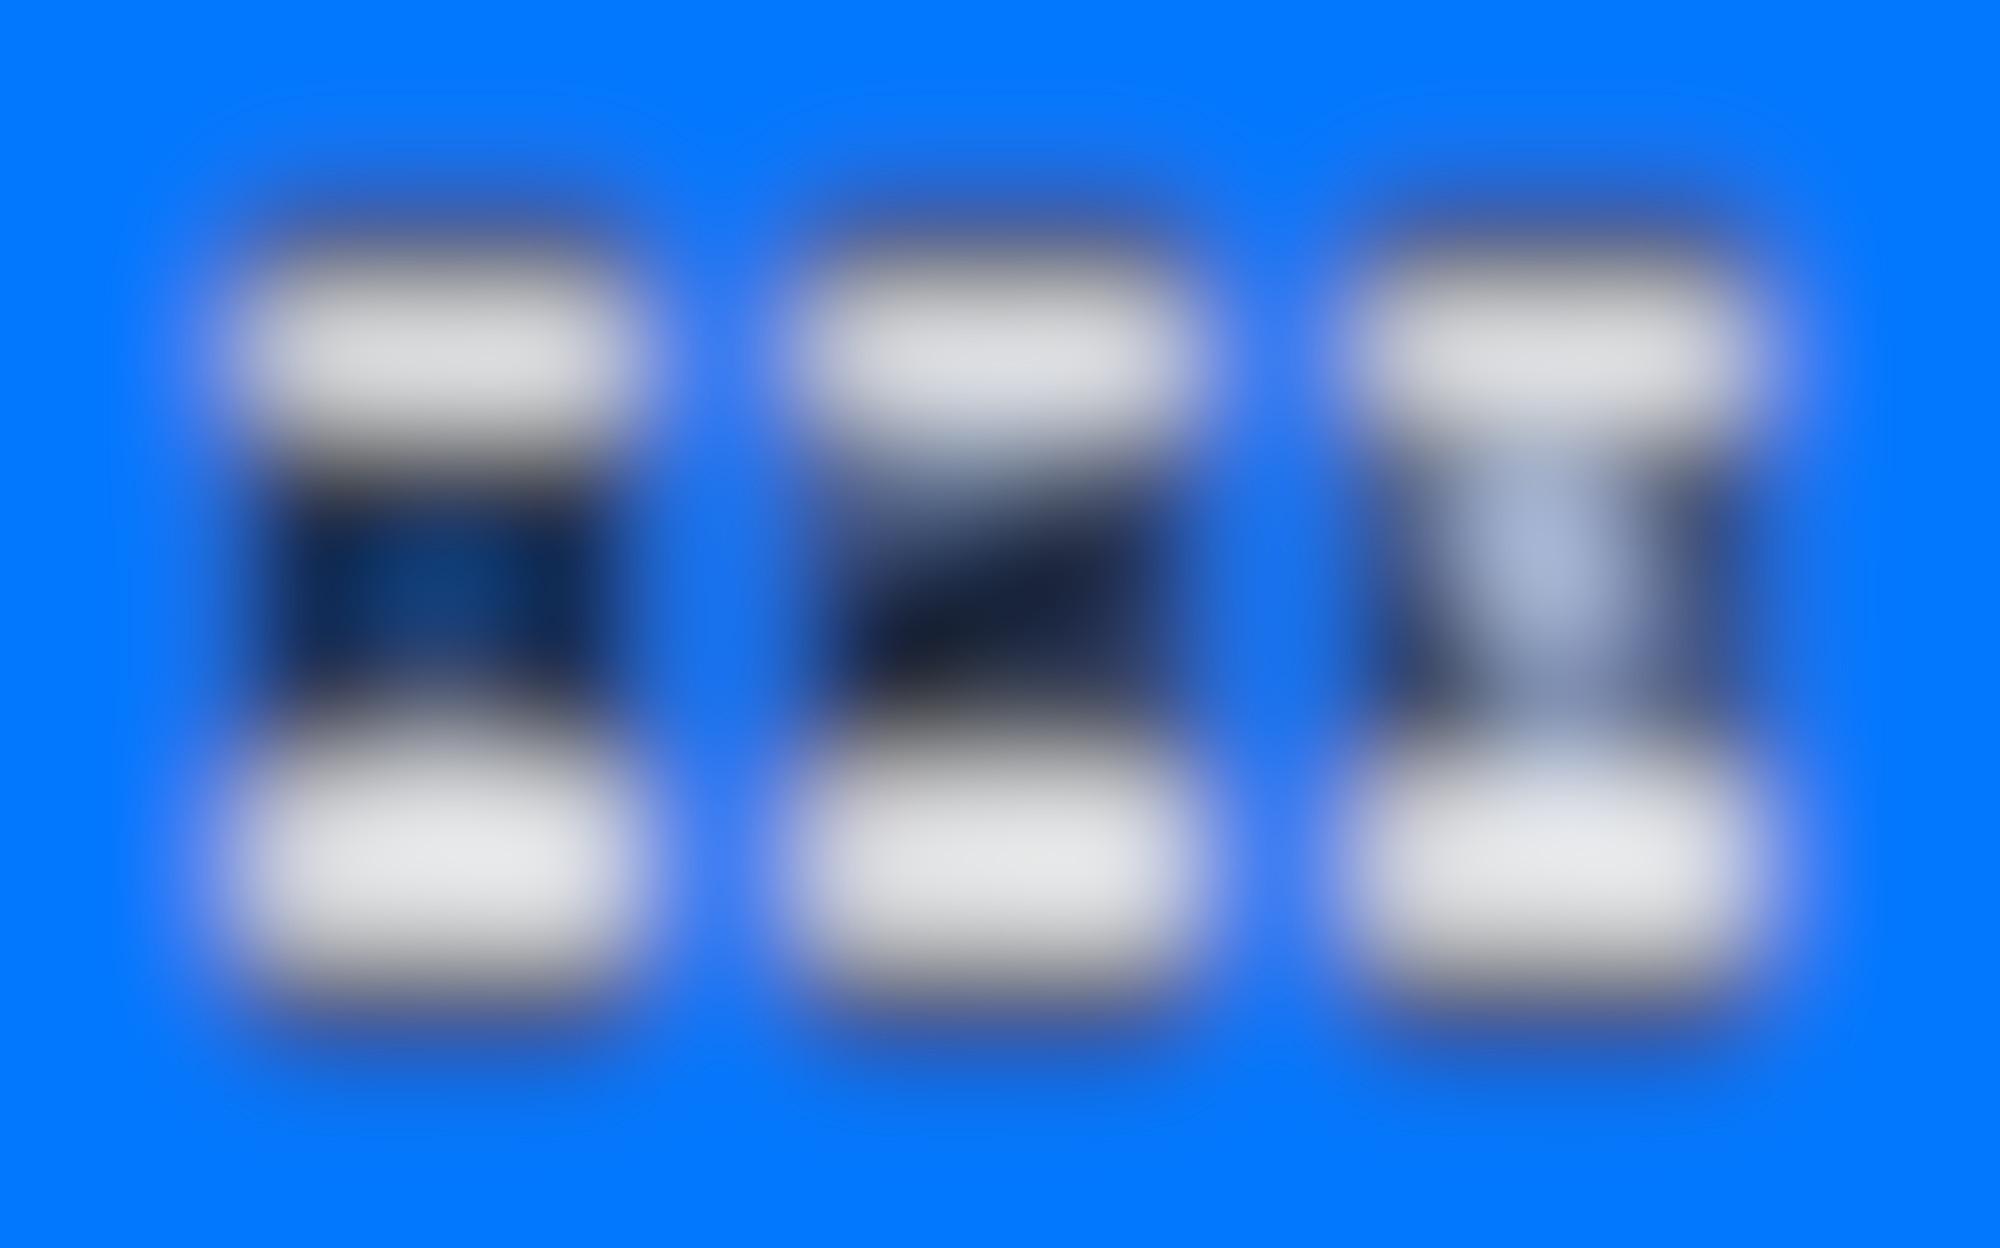 Phones v1 autocompressfitresizeixlibphp 1 1 0max h2000max w3 D2000q80s48920cf9548aee427fe7c637818ac483